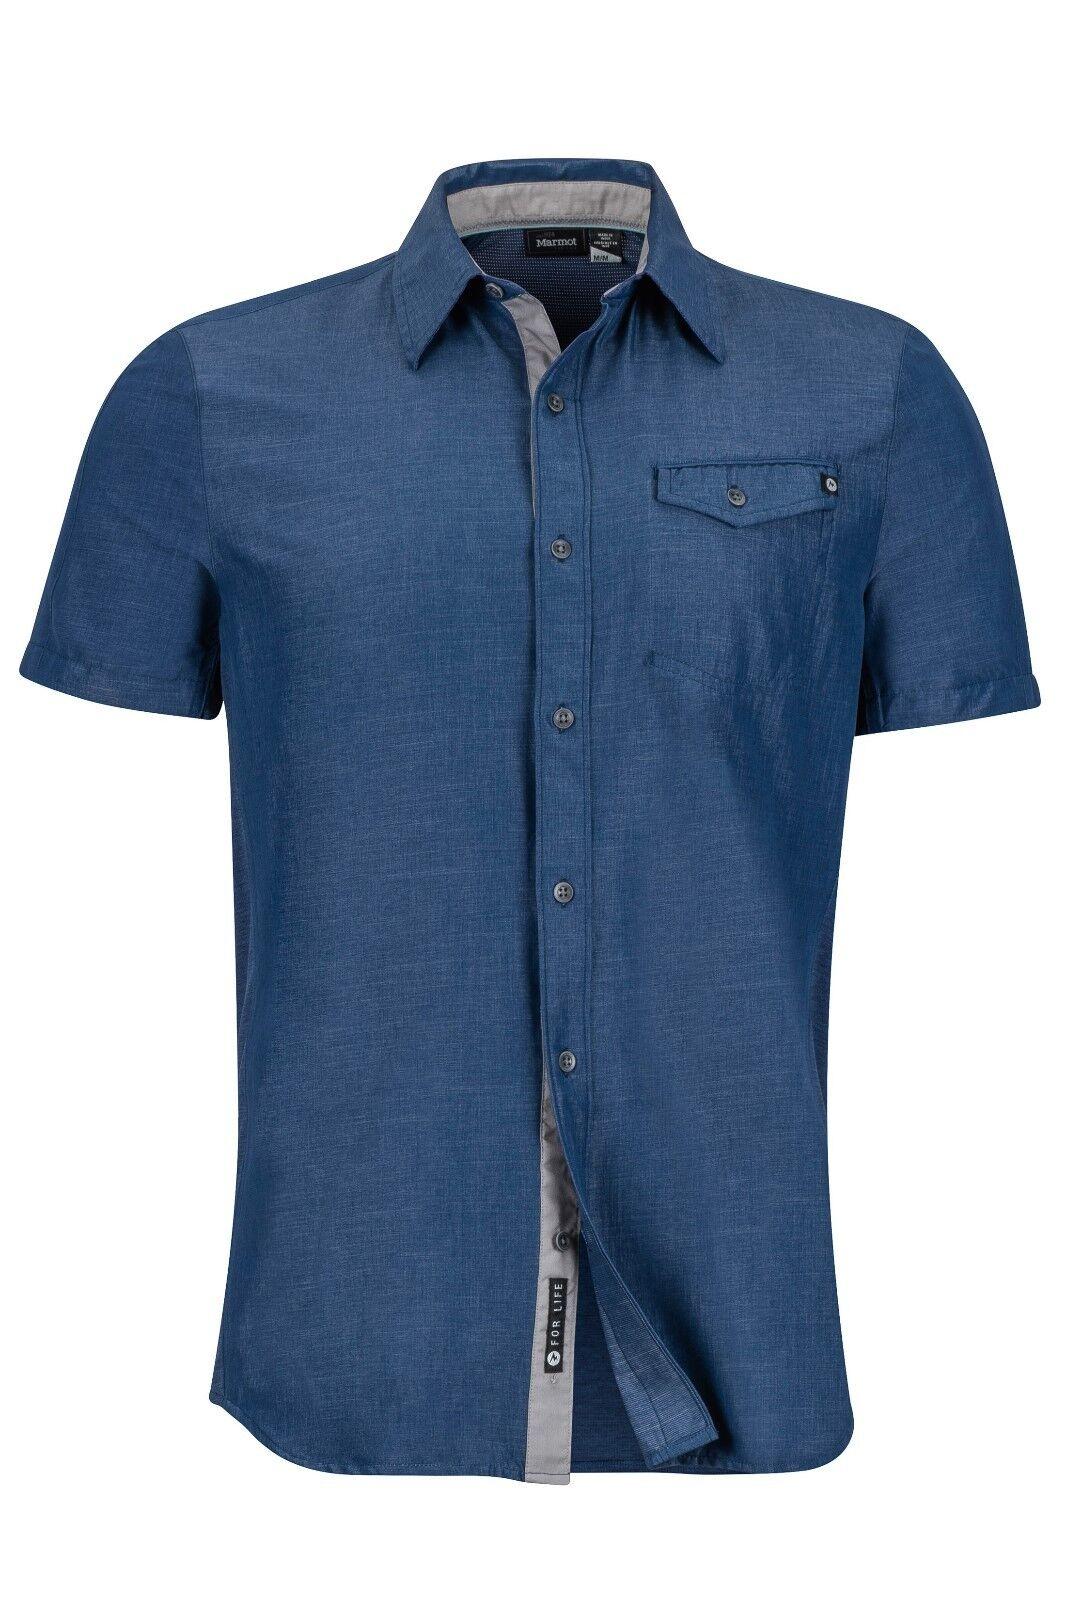 Marmot Contra Shirt Short Sleeve Funktionshemd für Herren vintage navy